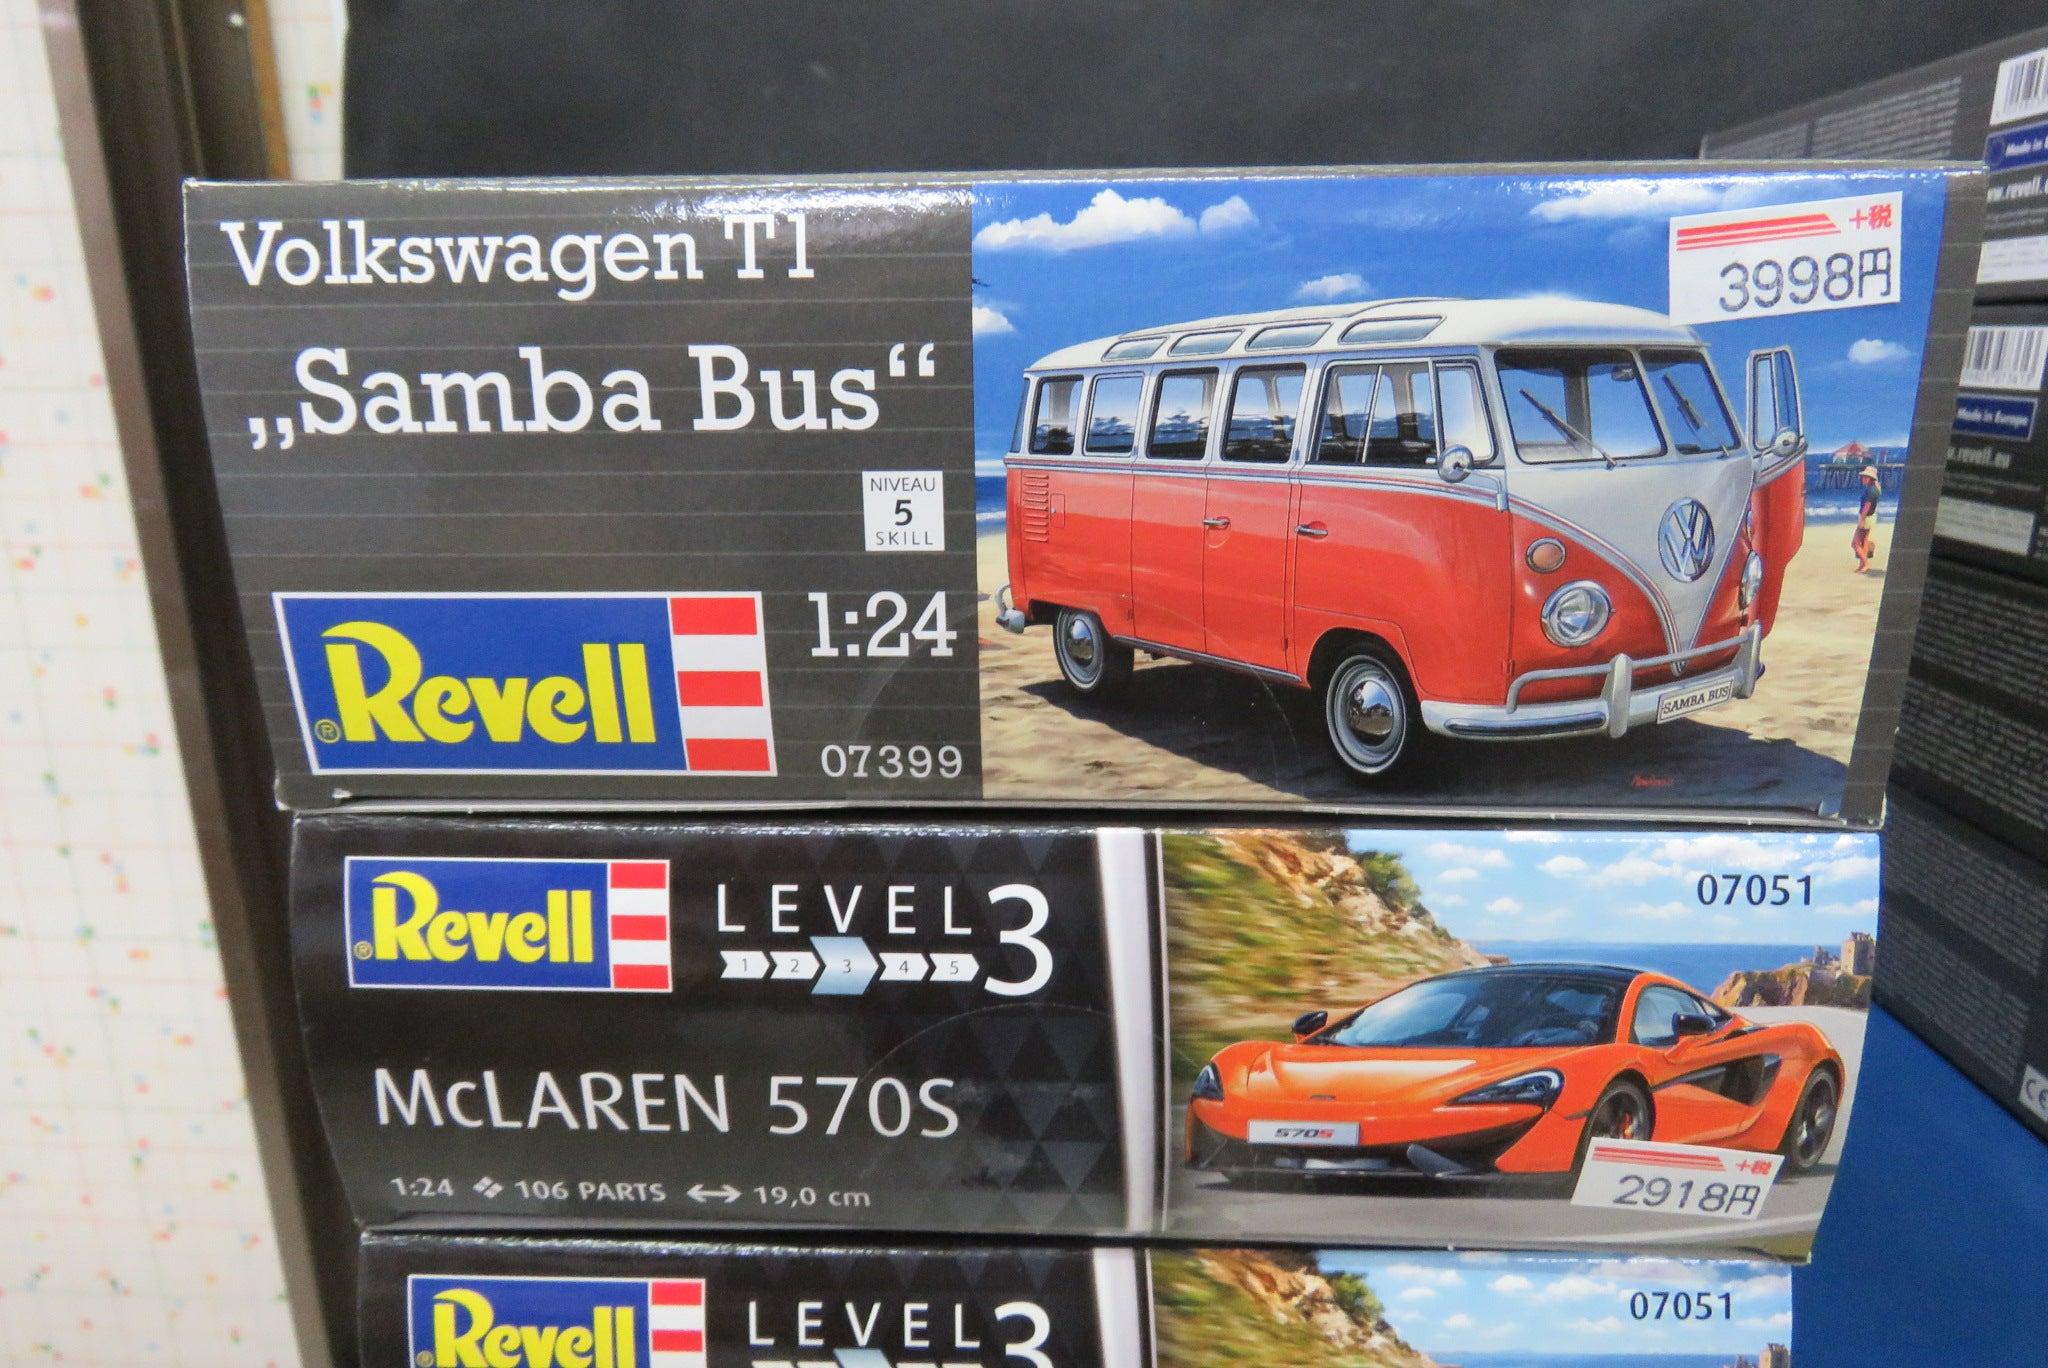 BUGATTI VEYRON GRAND SPORT VITESSE LEGEND JEAN BUGATTI 0179 Car Poster Poster